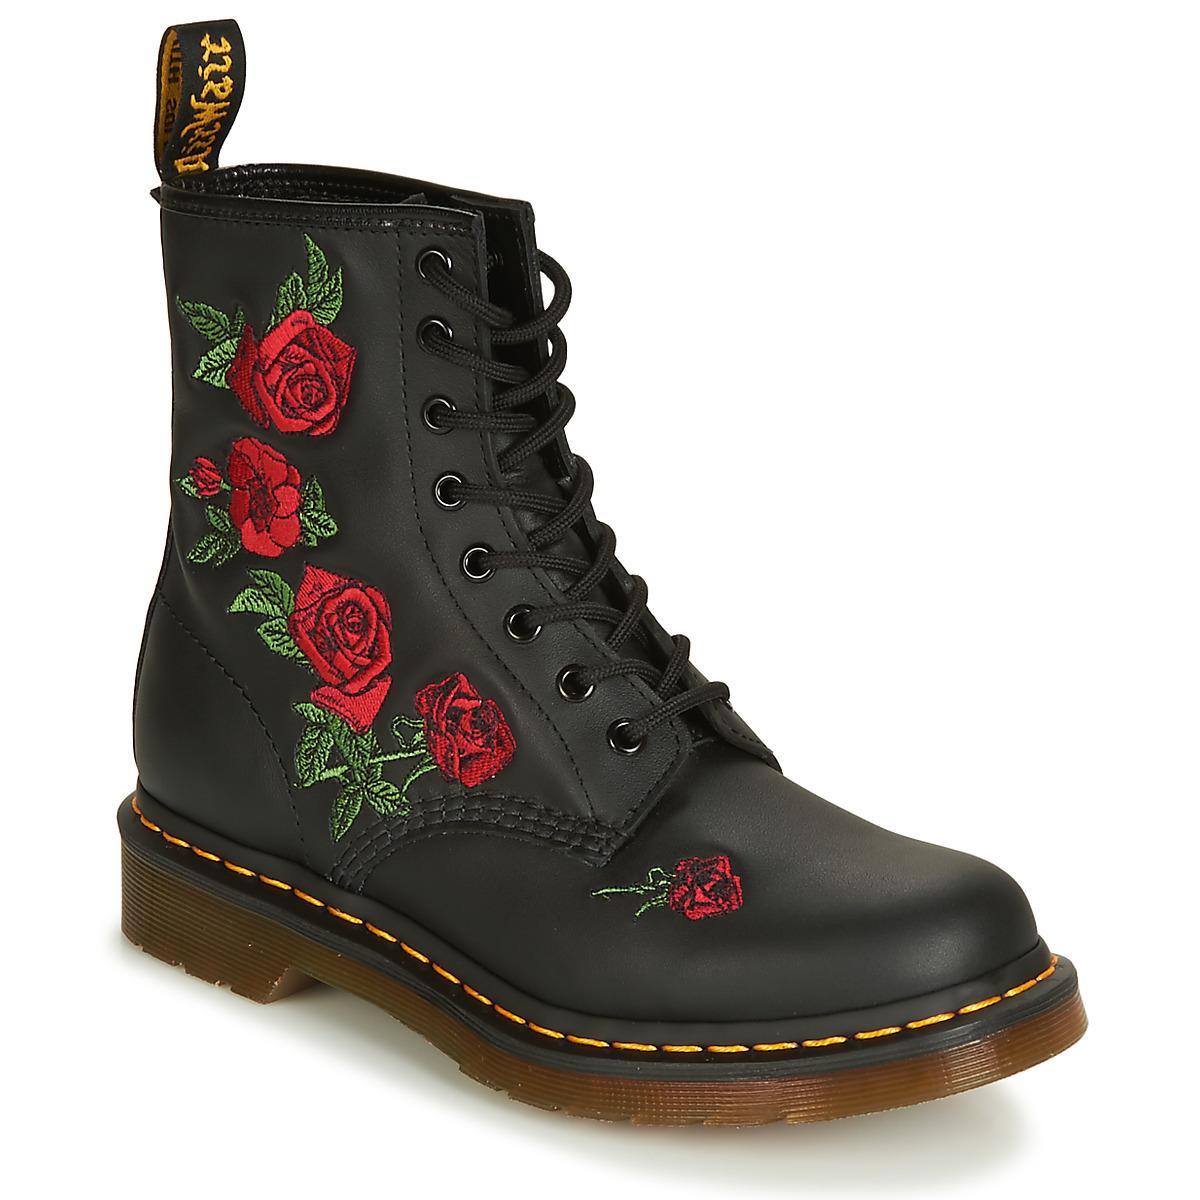 Støvler Dr Martens  1460 VONDA